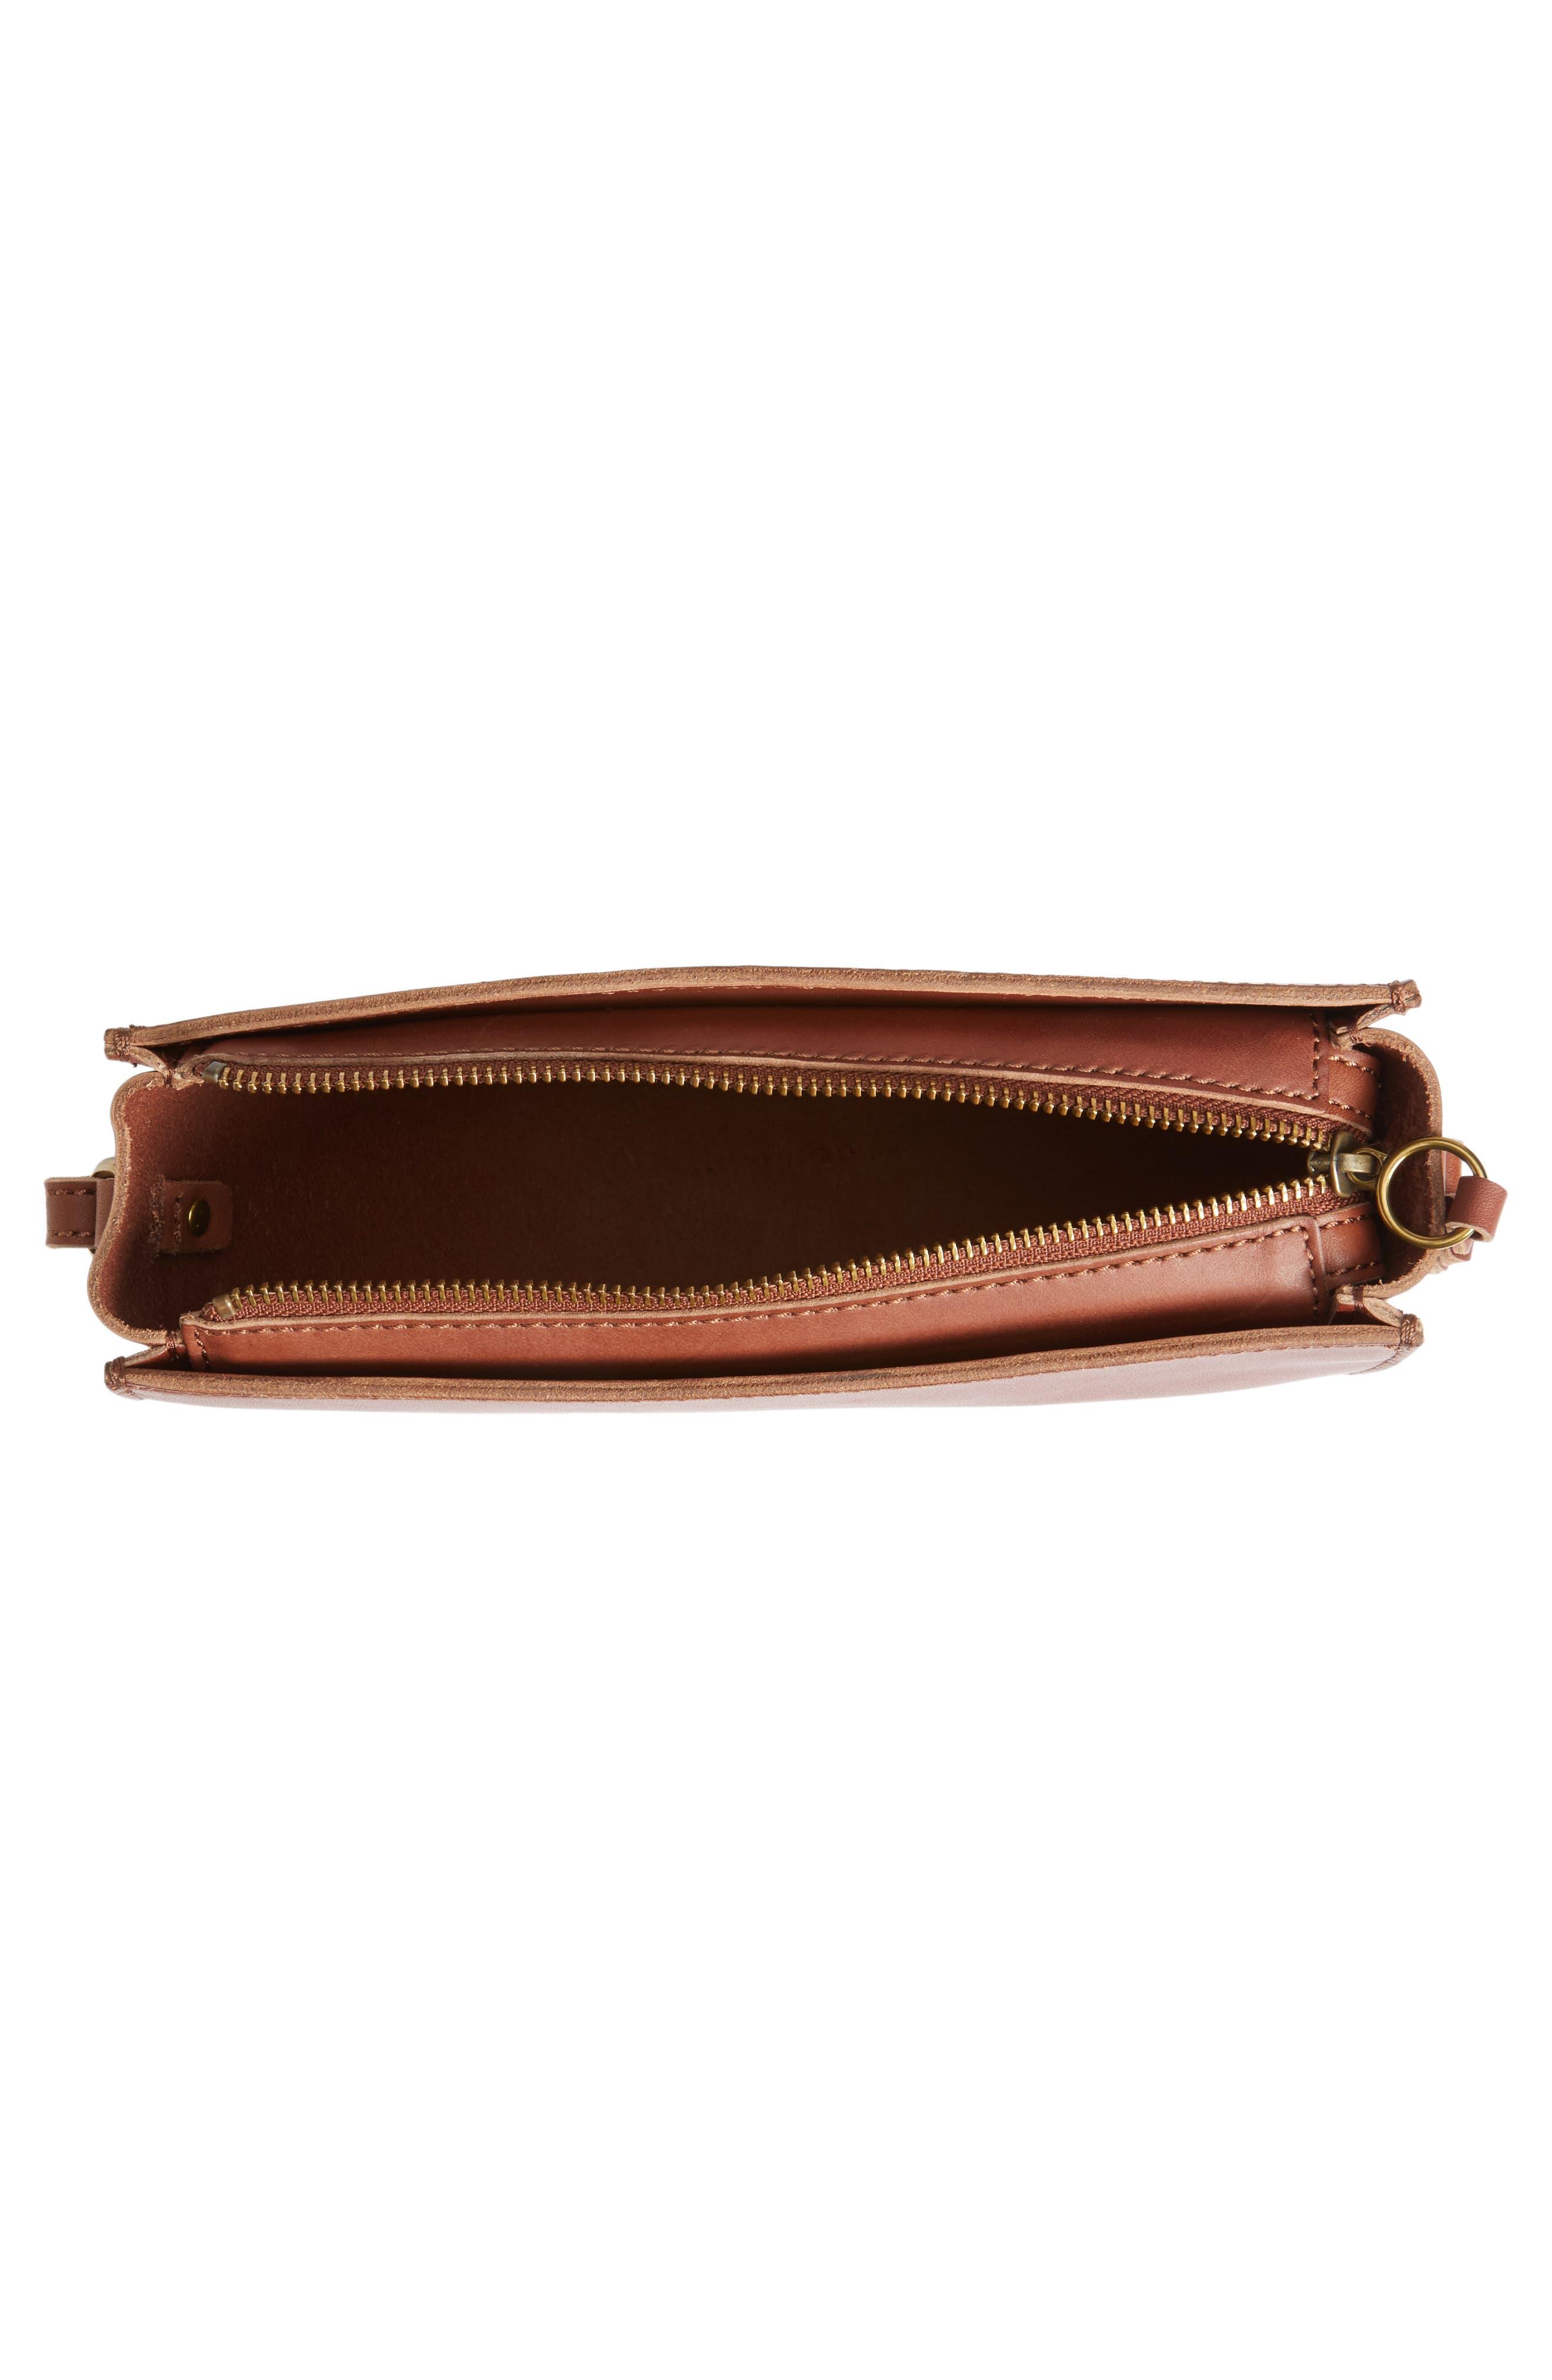 Juniper Vachetta Leather Half Moon Crossbody Bag,                             Alternate thumbnail 12, color,